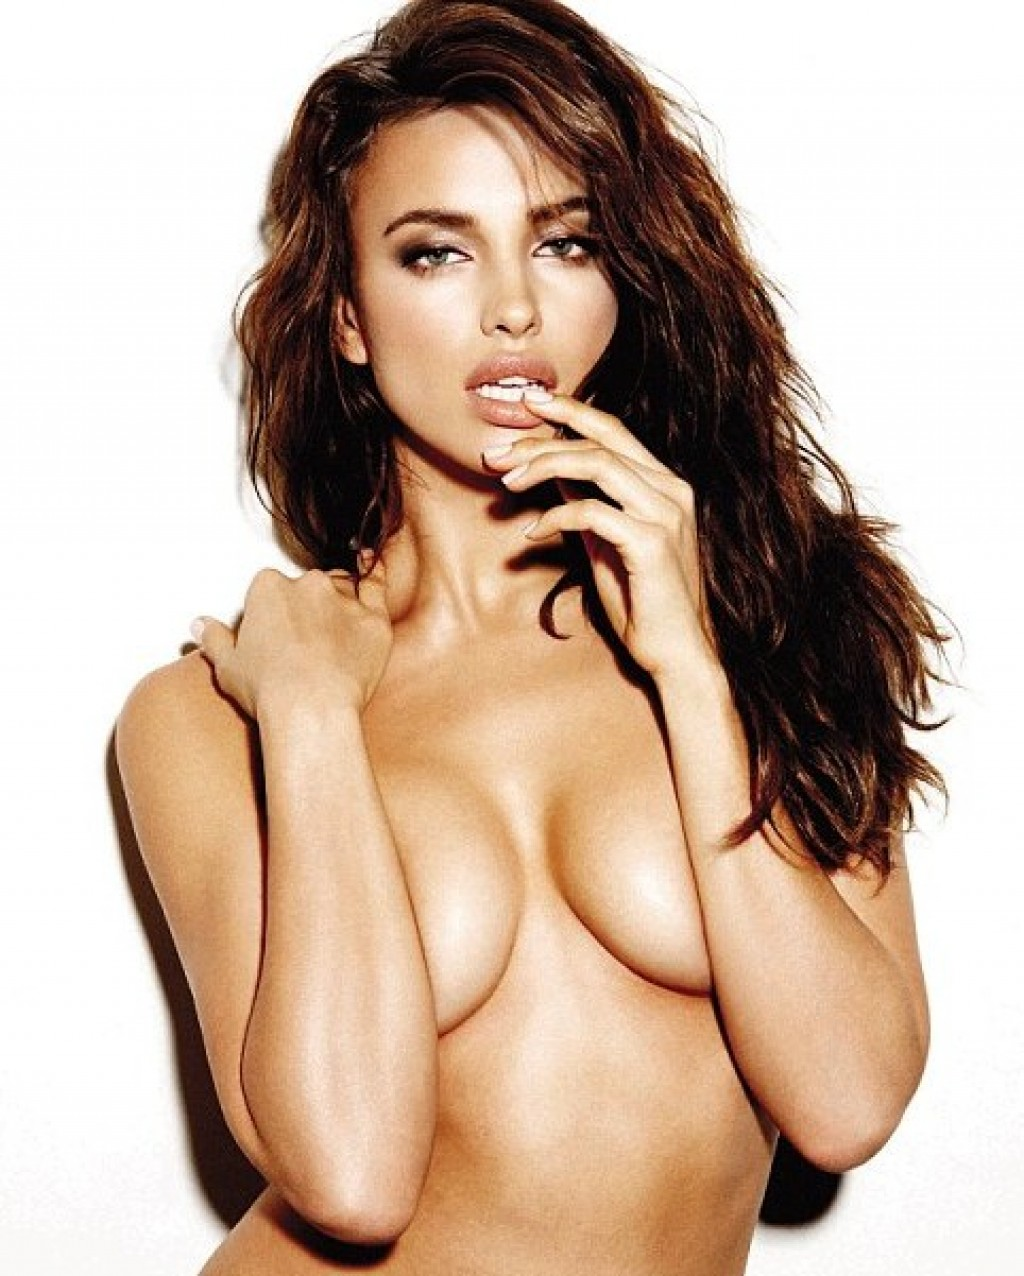 irina shayk sexy hot nue mannequin russe femme du footballeur ballon d 'or 2013 cristiano ronaldo joueur du real madrid